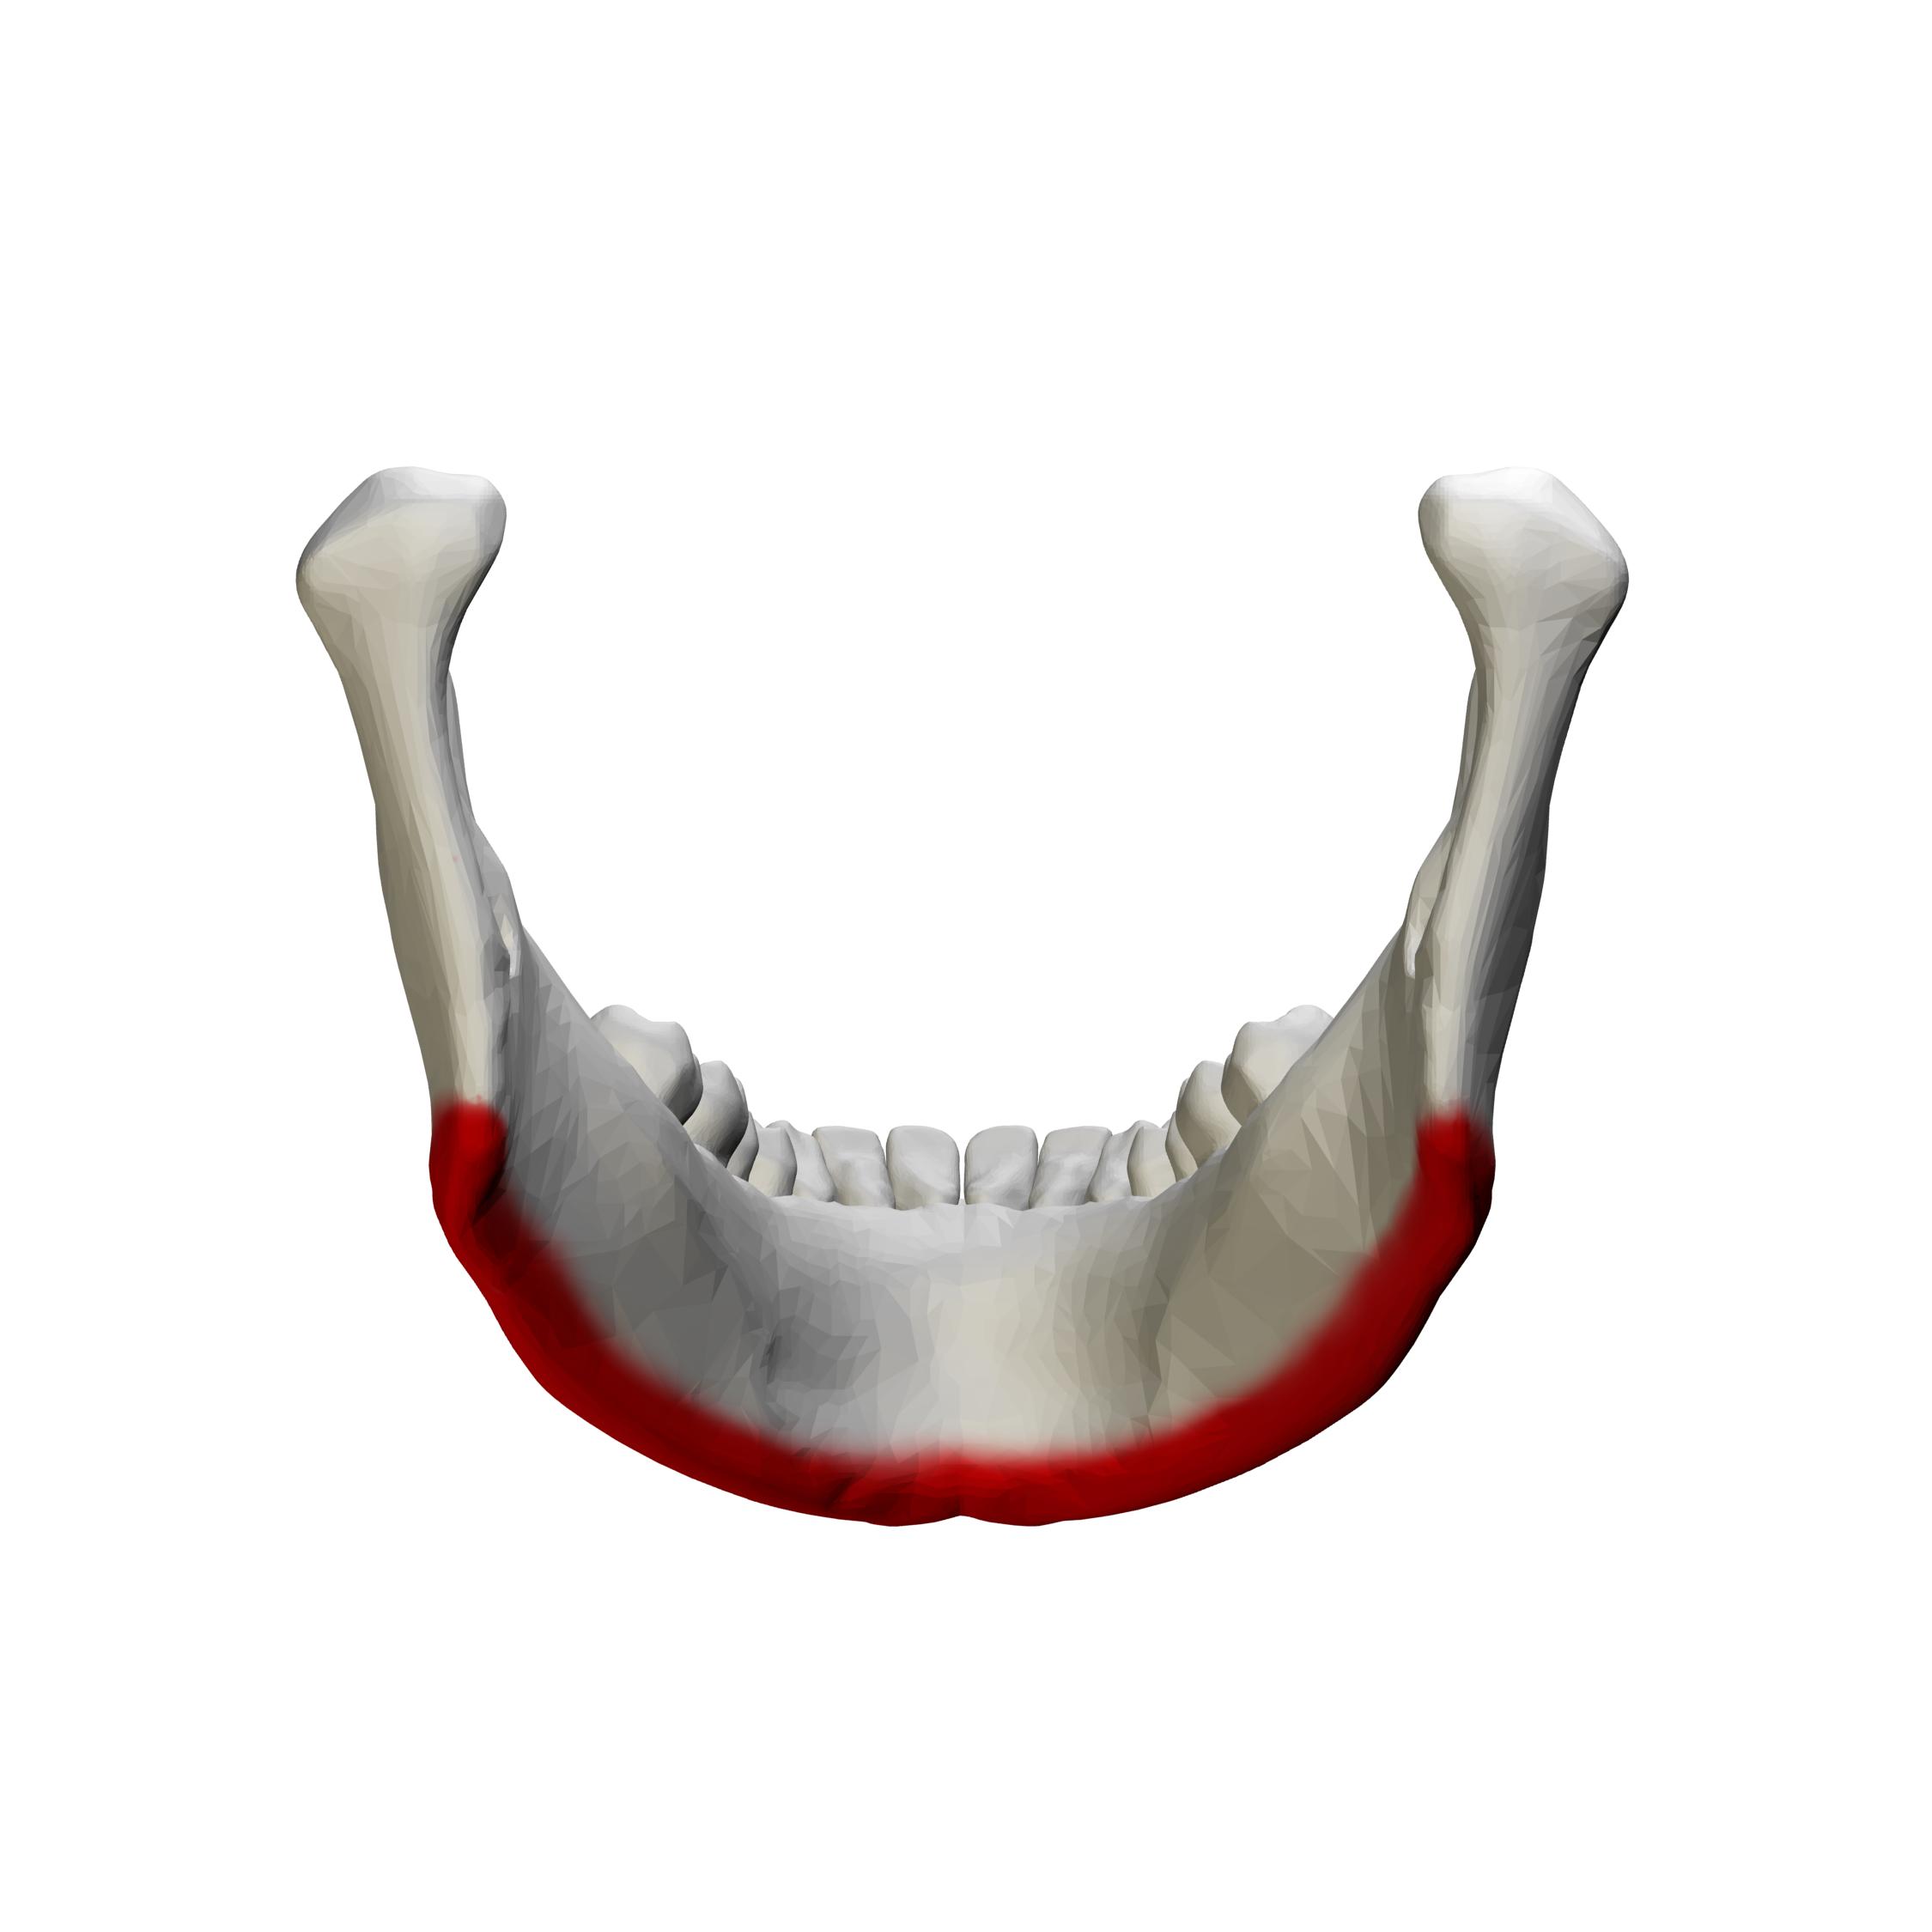 filebase of mandible close up posterior view01png